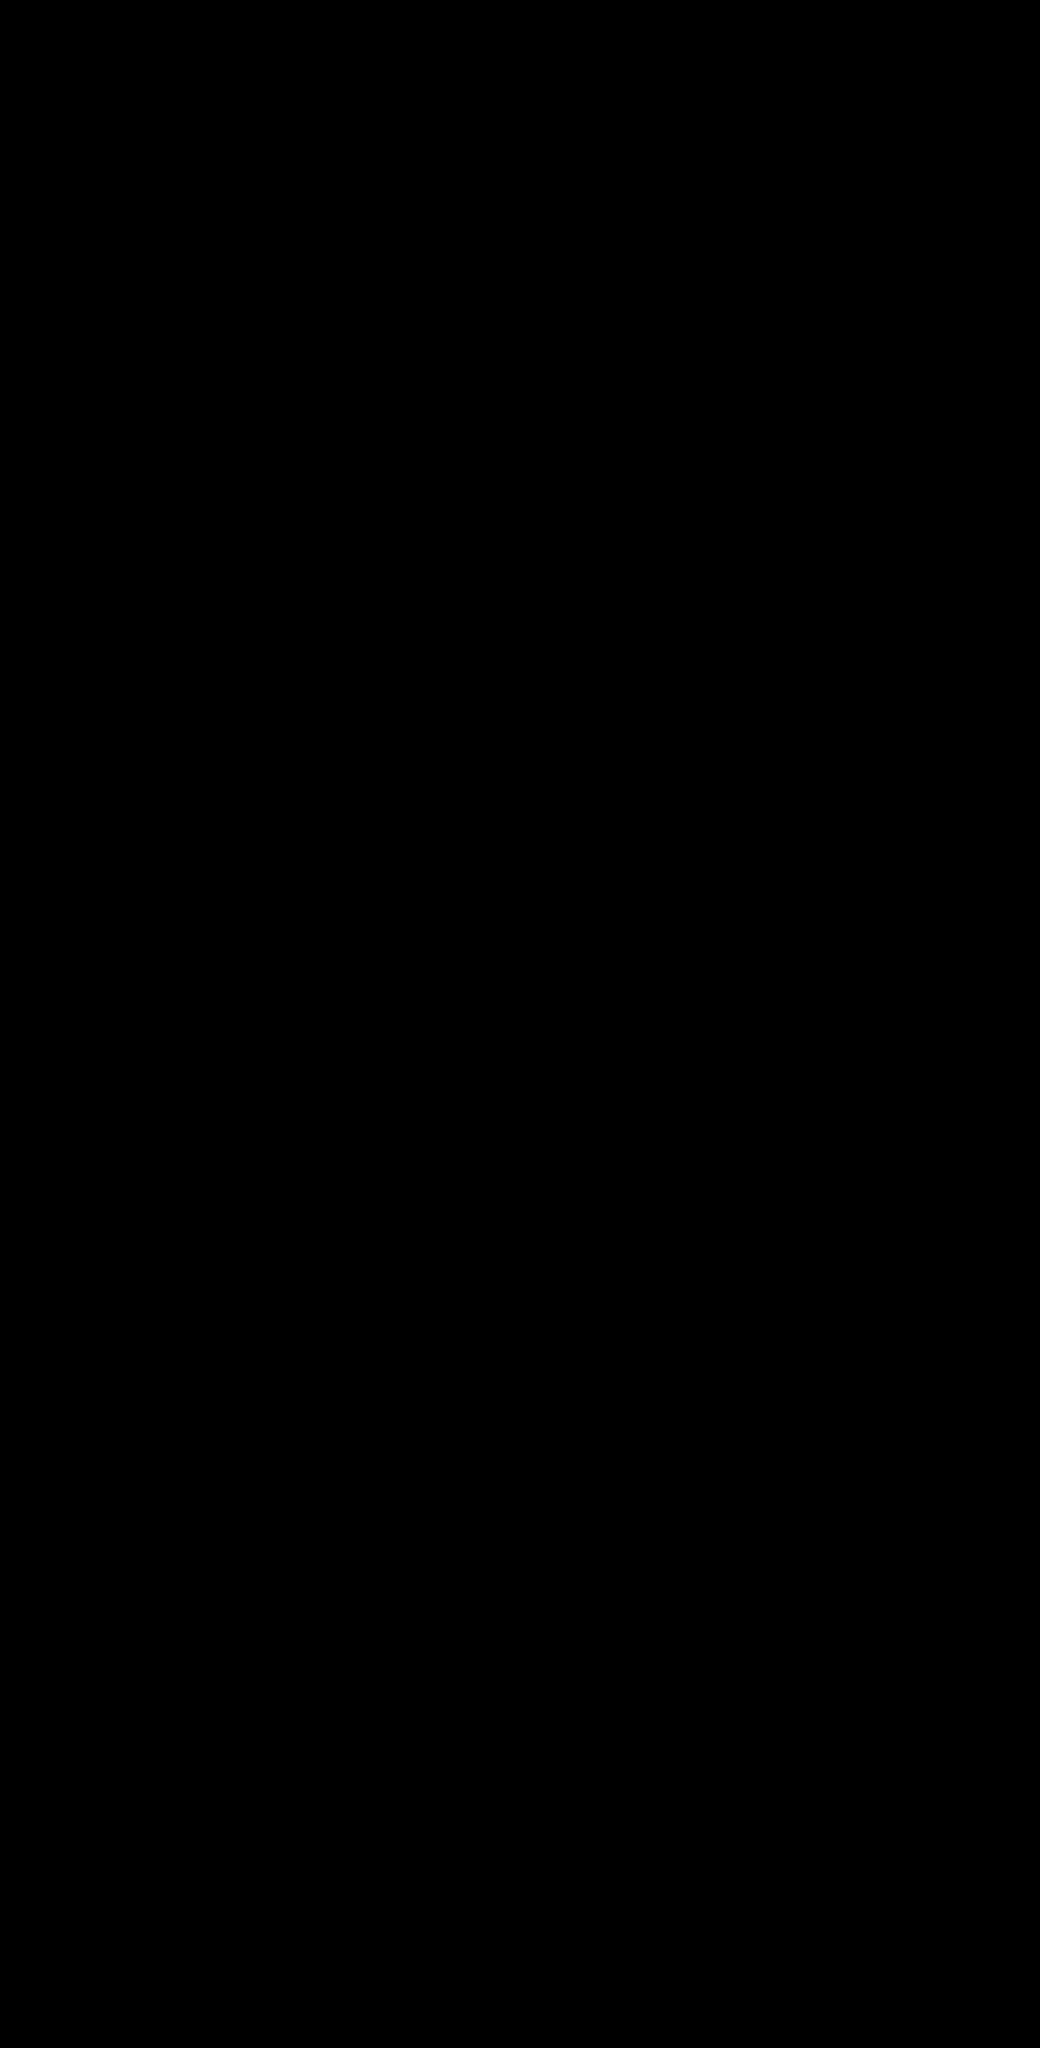 1040x2048 Disney Princess Silhouettes Black And White